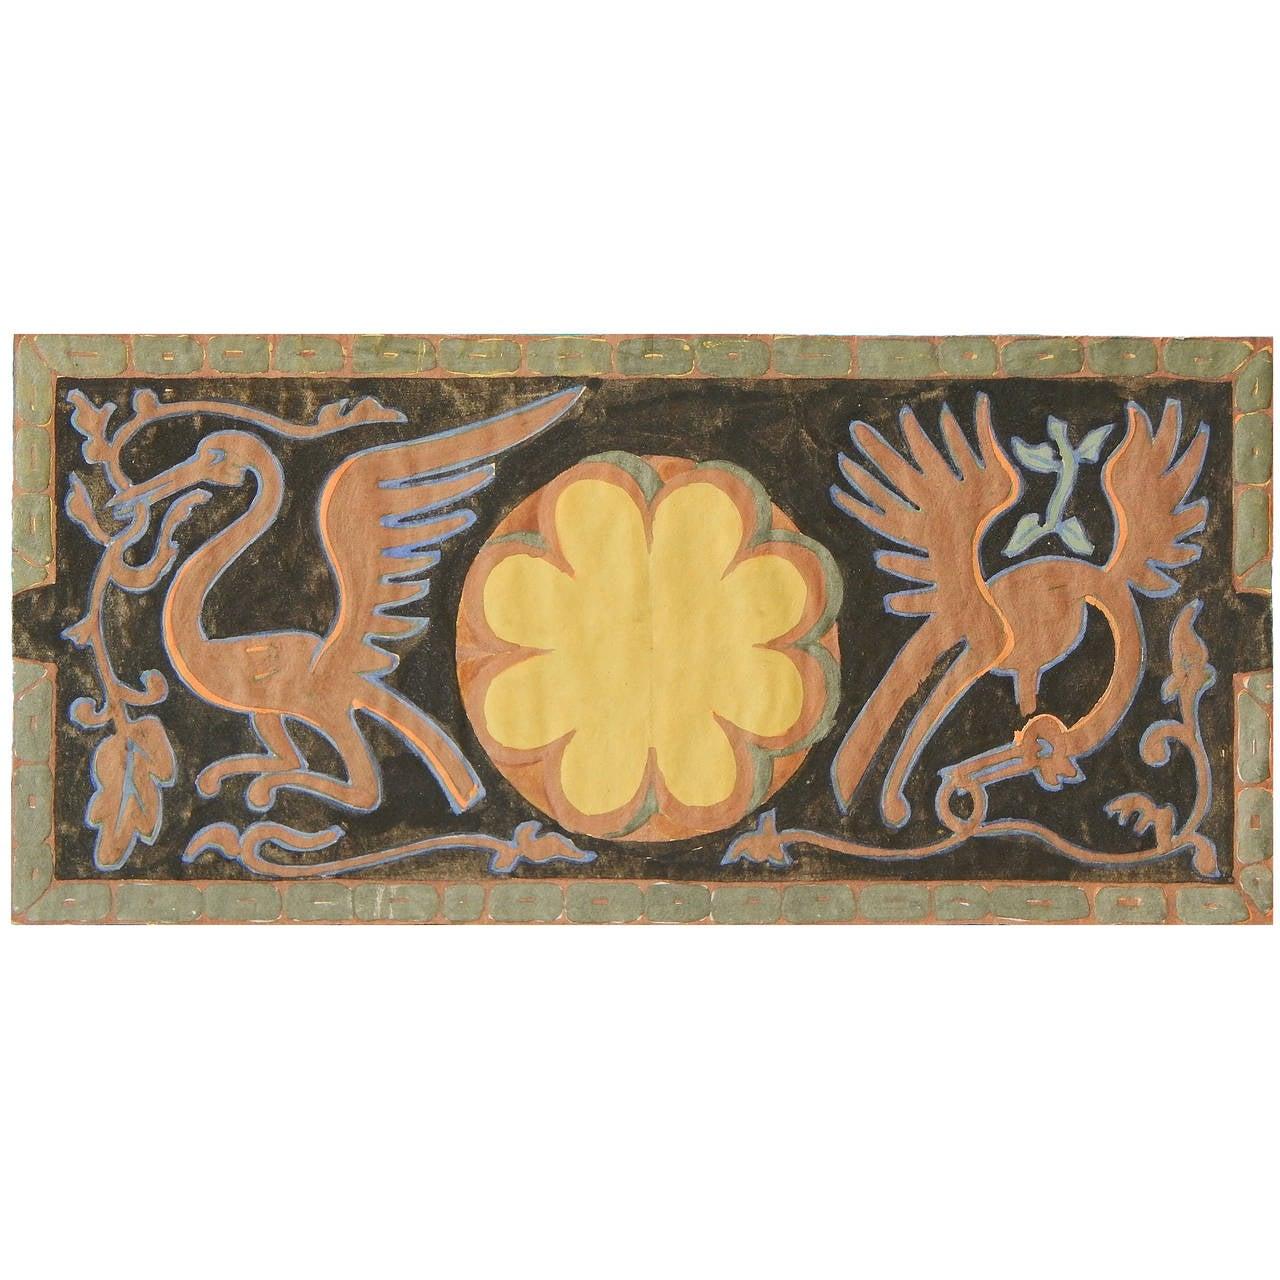 Exotic Bird Frieze, Art Deco Decorative Painting by Dunbar Beck For Sale